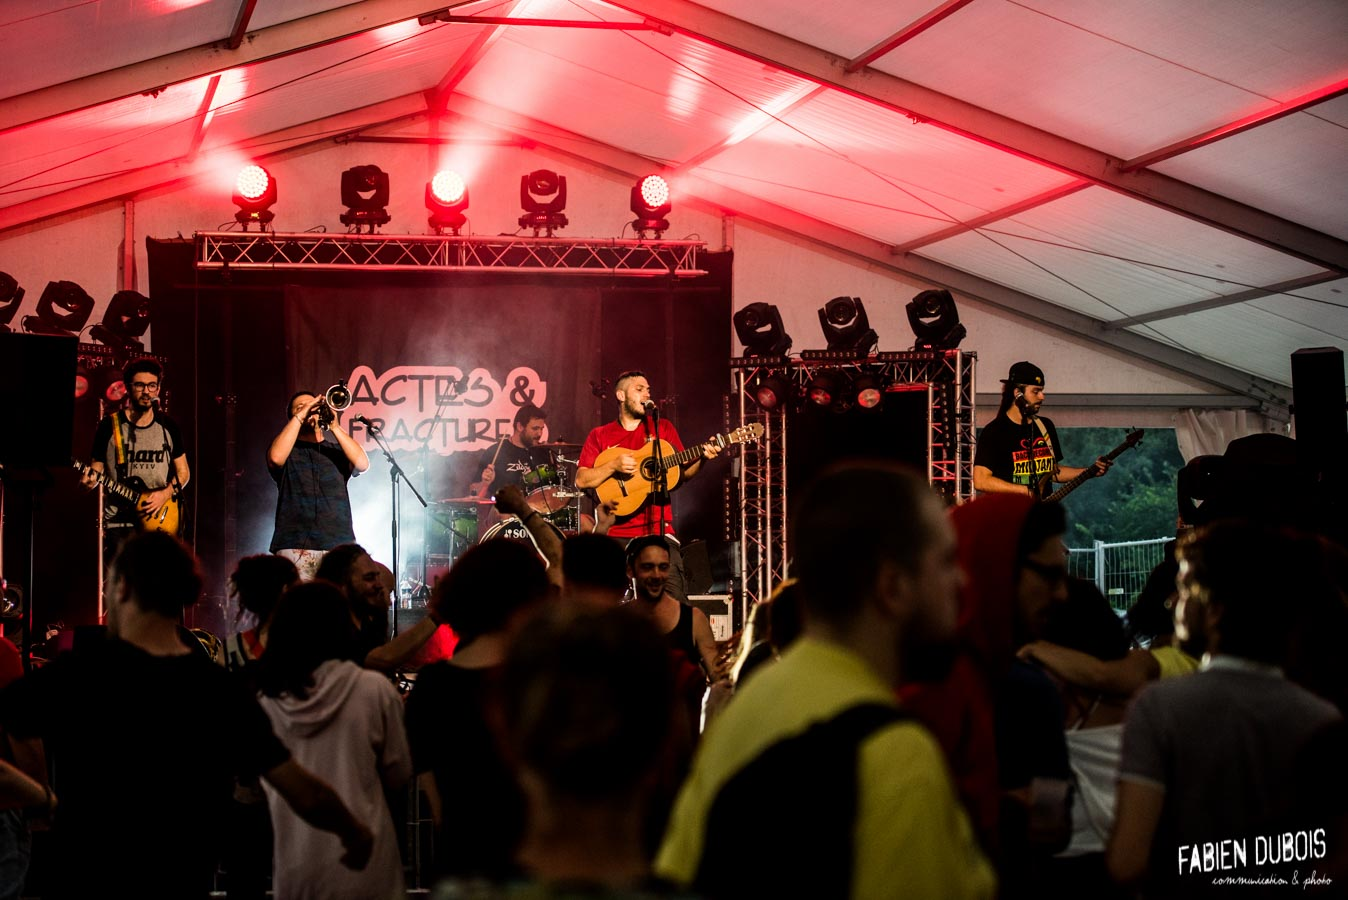 Photo Actes et Fractures Europopcon Festival Mervans Samedi 2018